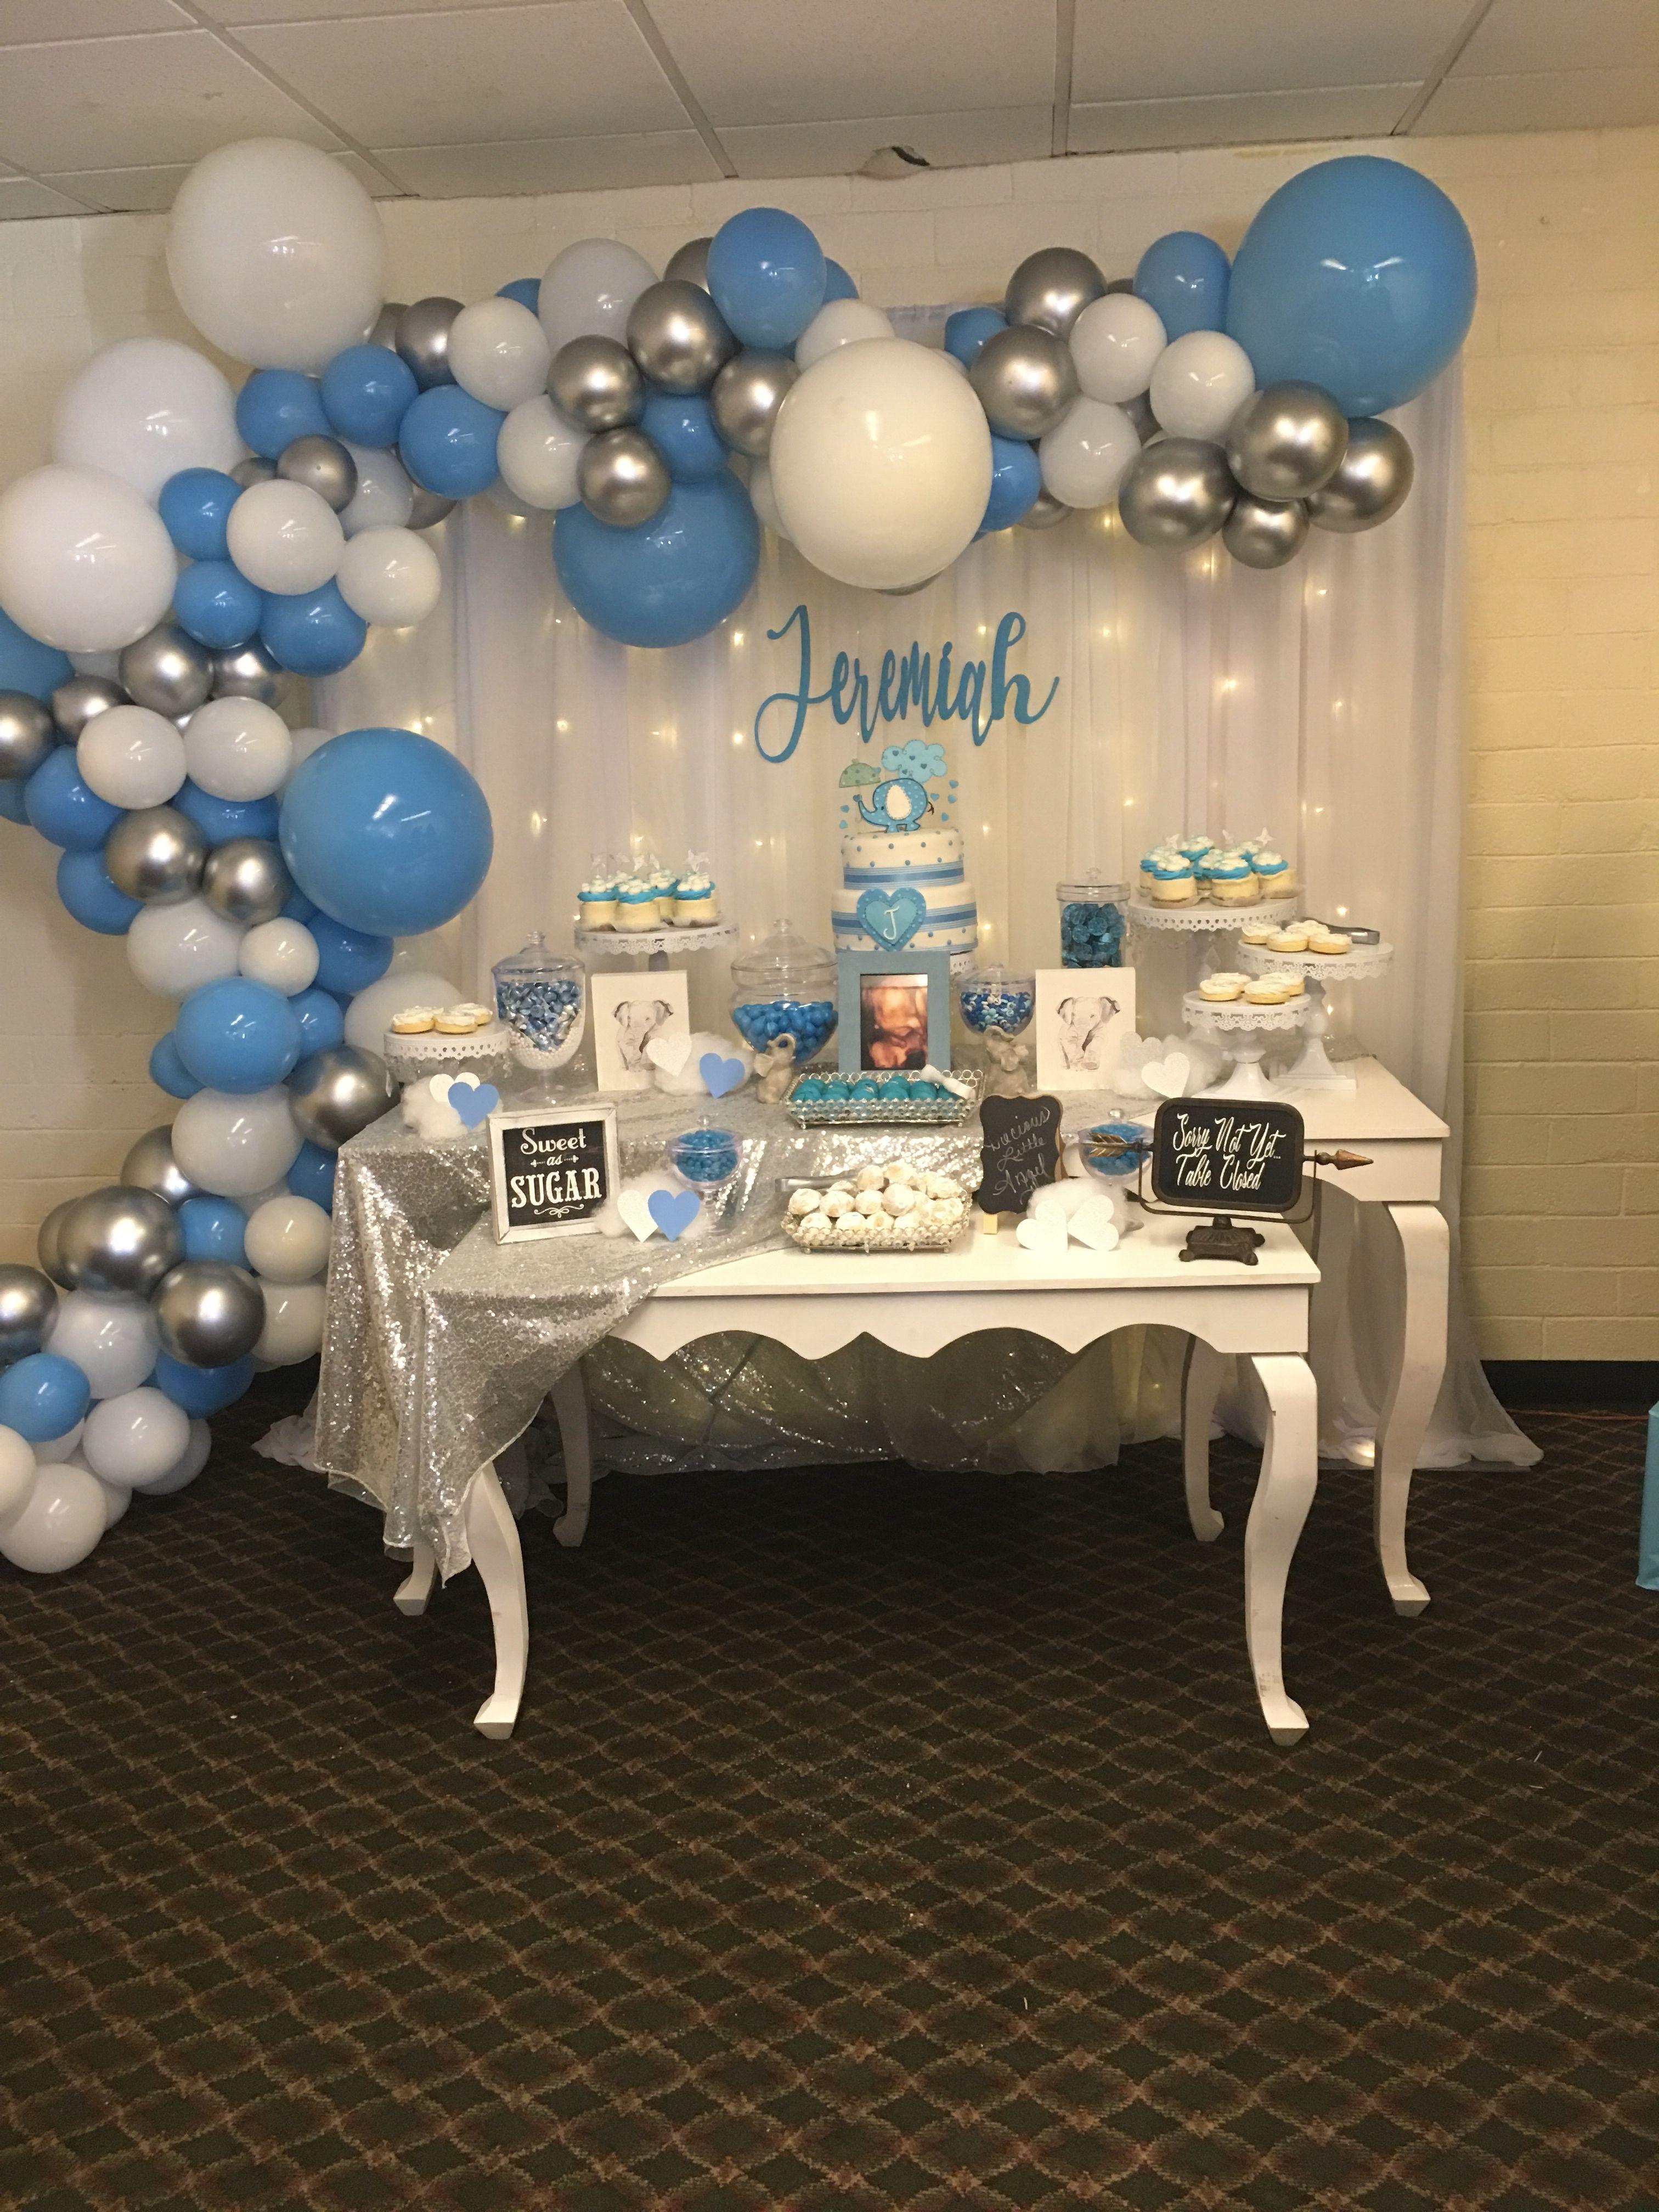 Boy Baby Shower Baby Shower Balloons Blue Baby Shower Decorations Baby Shower Decorations